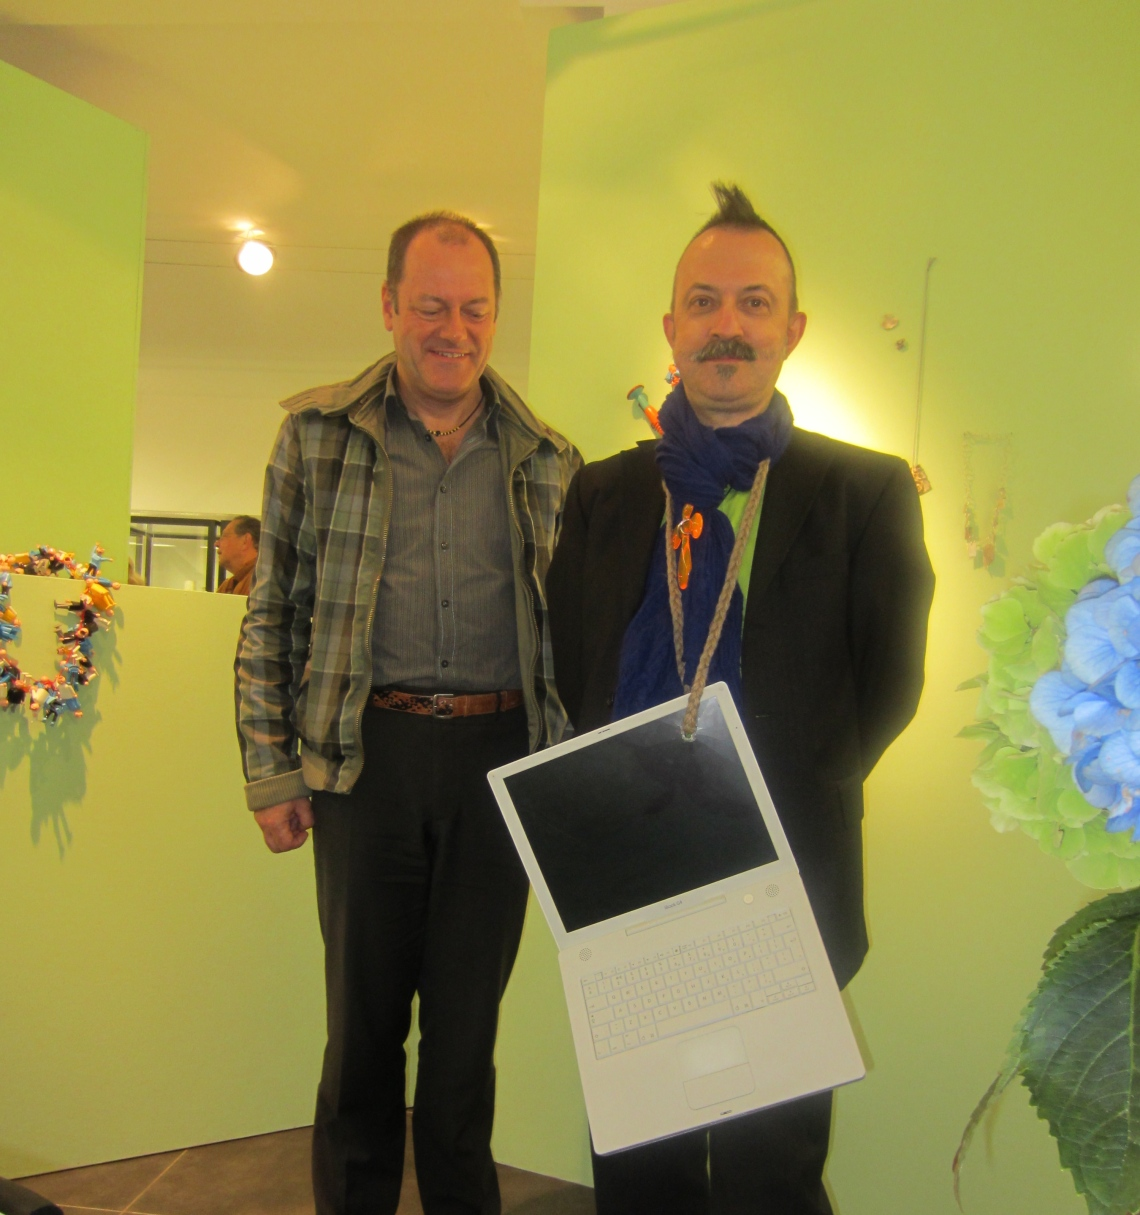 Paul Derrez, met halssieraad van Lisa Walker. Foto met dank aan M.O.©